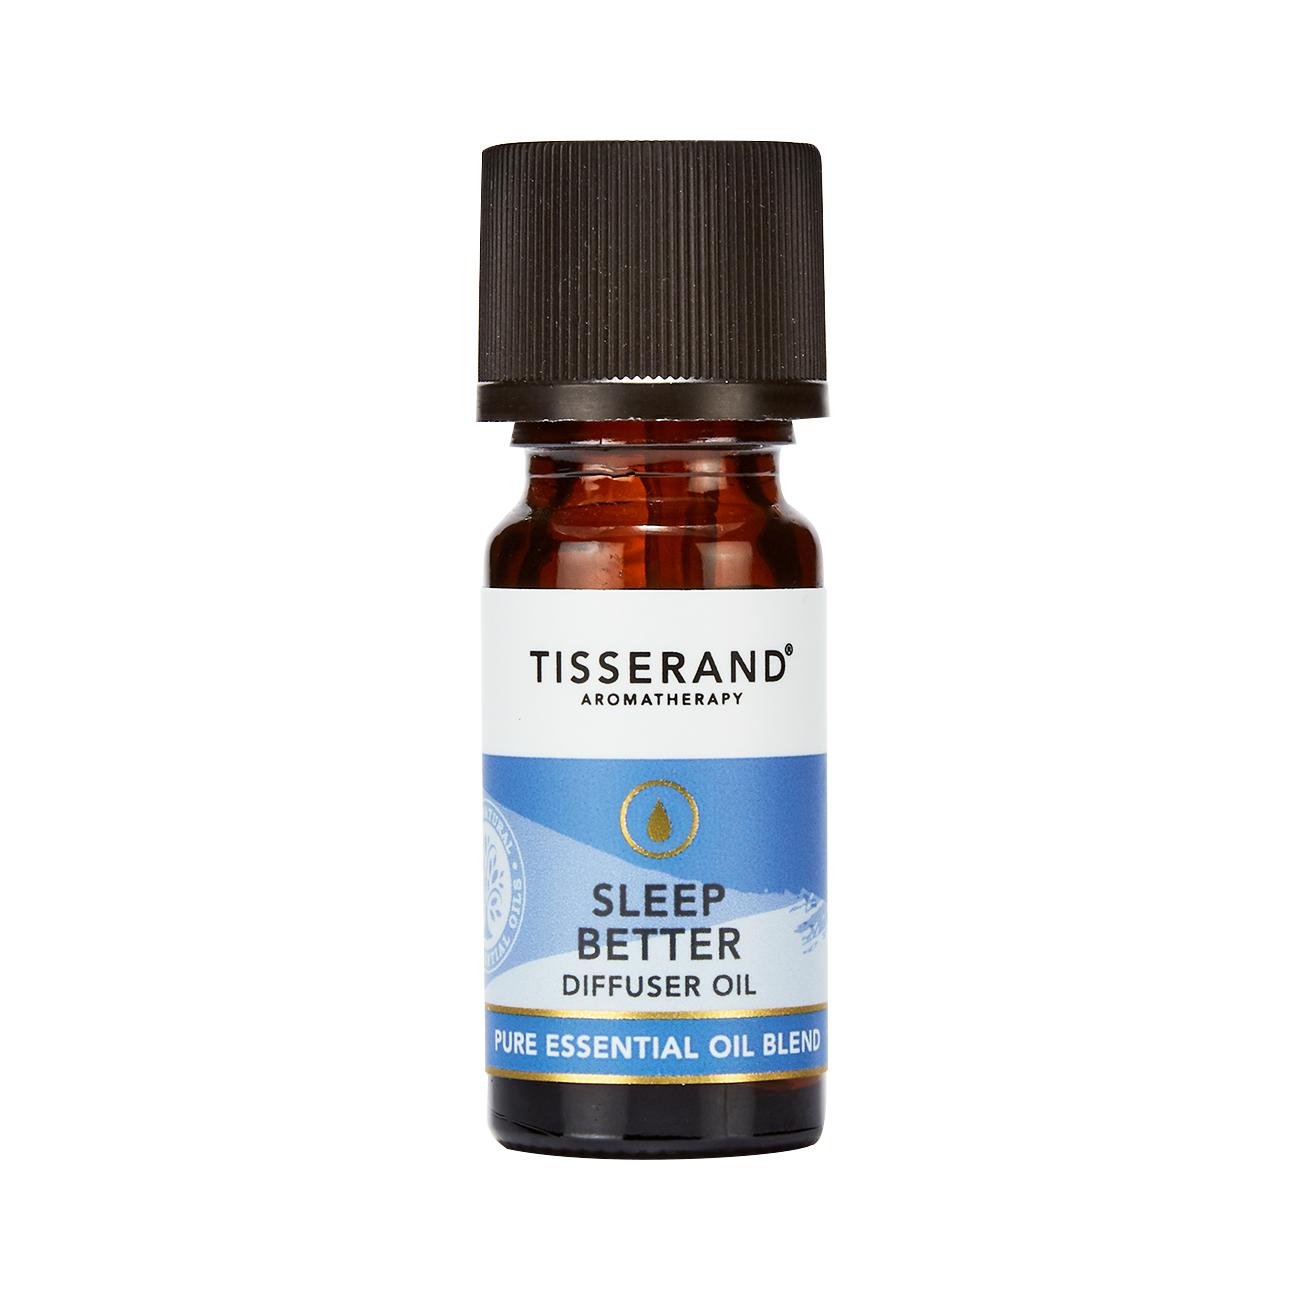 Sleep Better Diffuser Oil 9ml